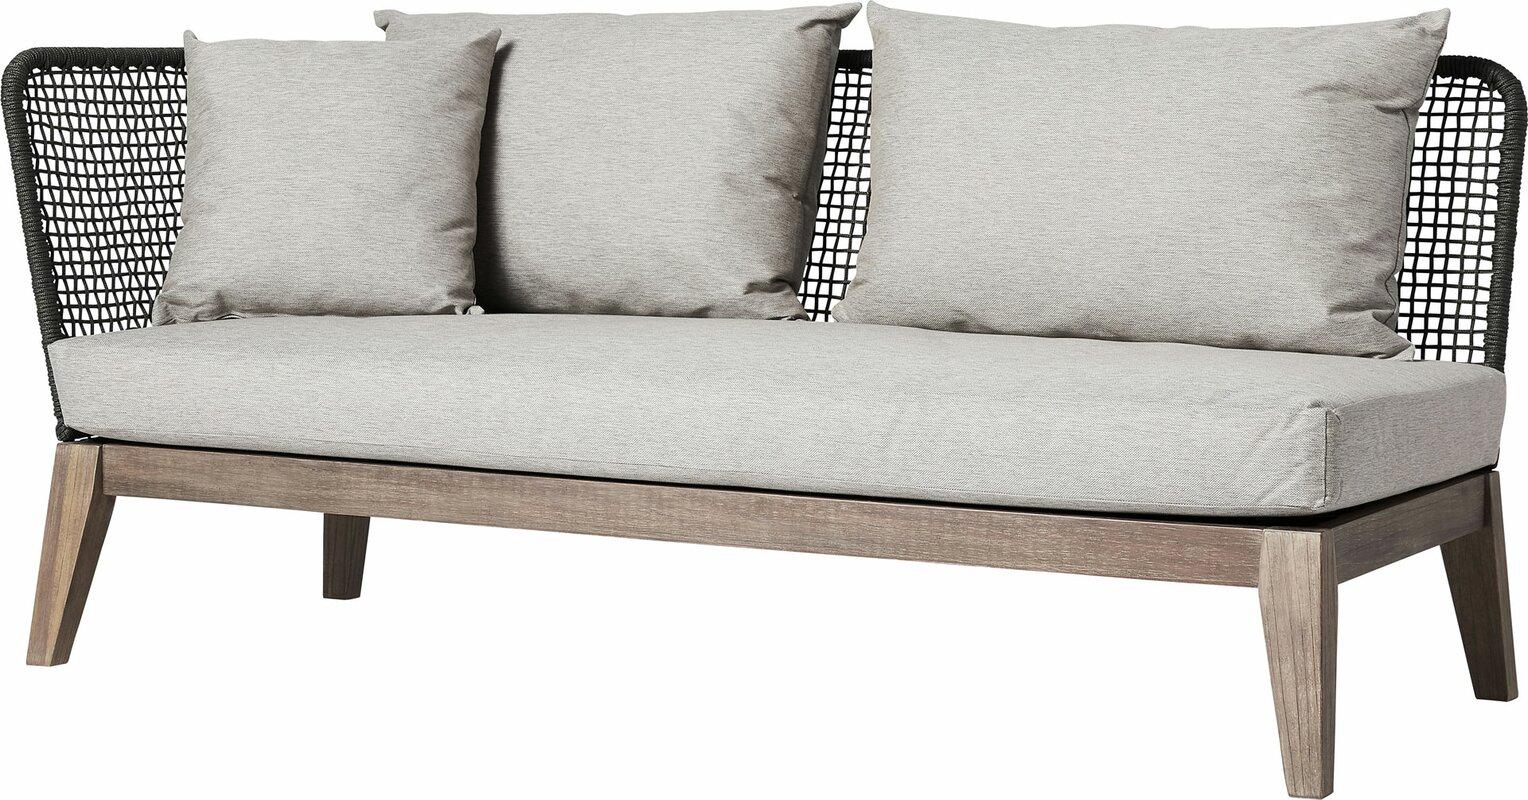 Netta Patio Sofa With Cushion